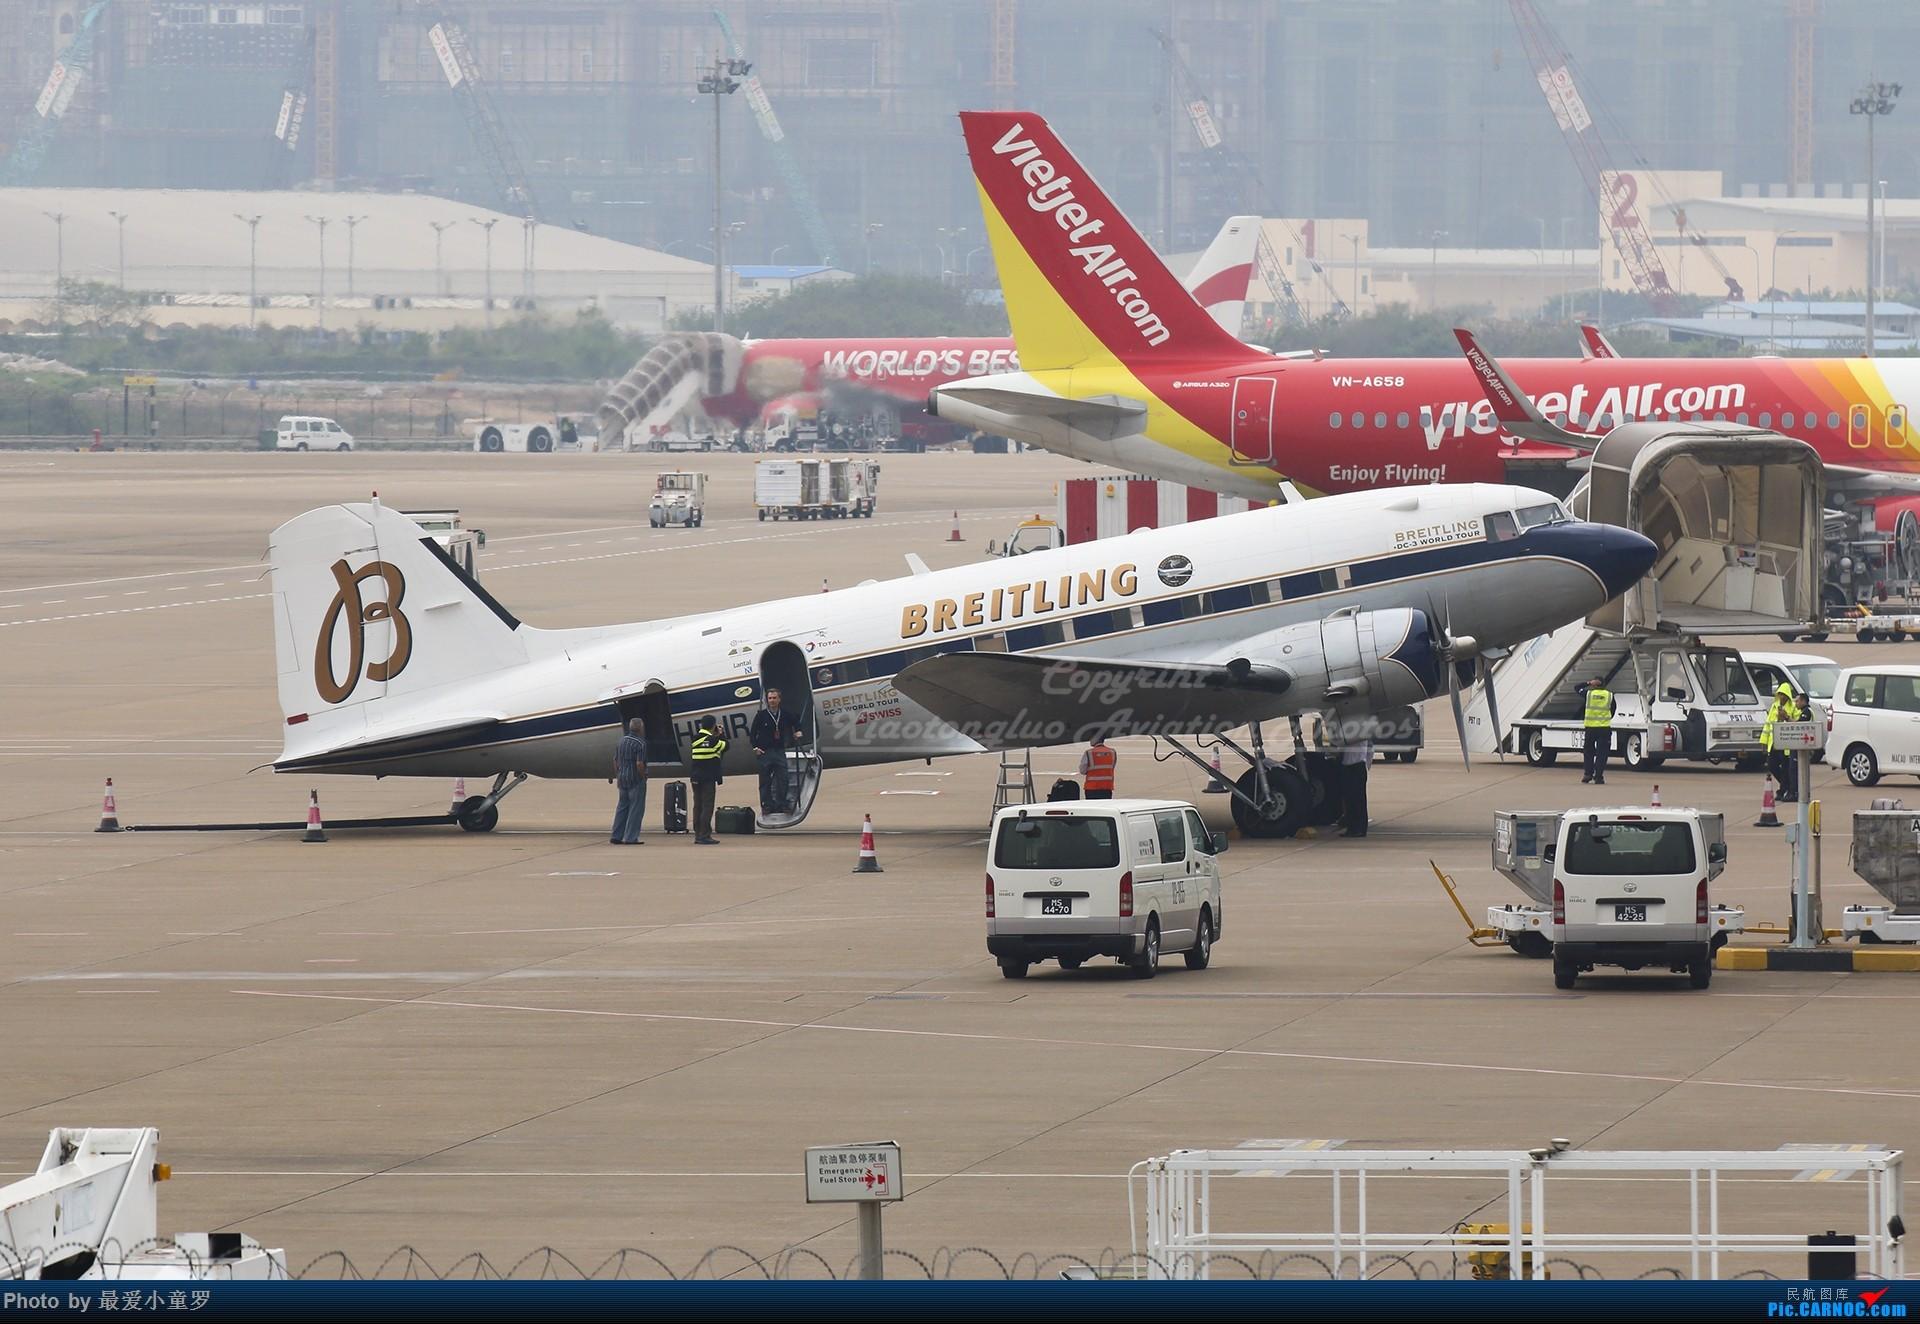 Re:[原创]2013-2018,系列组图纪念拍机5周年 道格拉斯DC-3 HB-IRJ 中国澳门国际机场